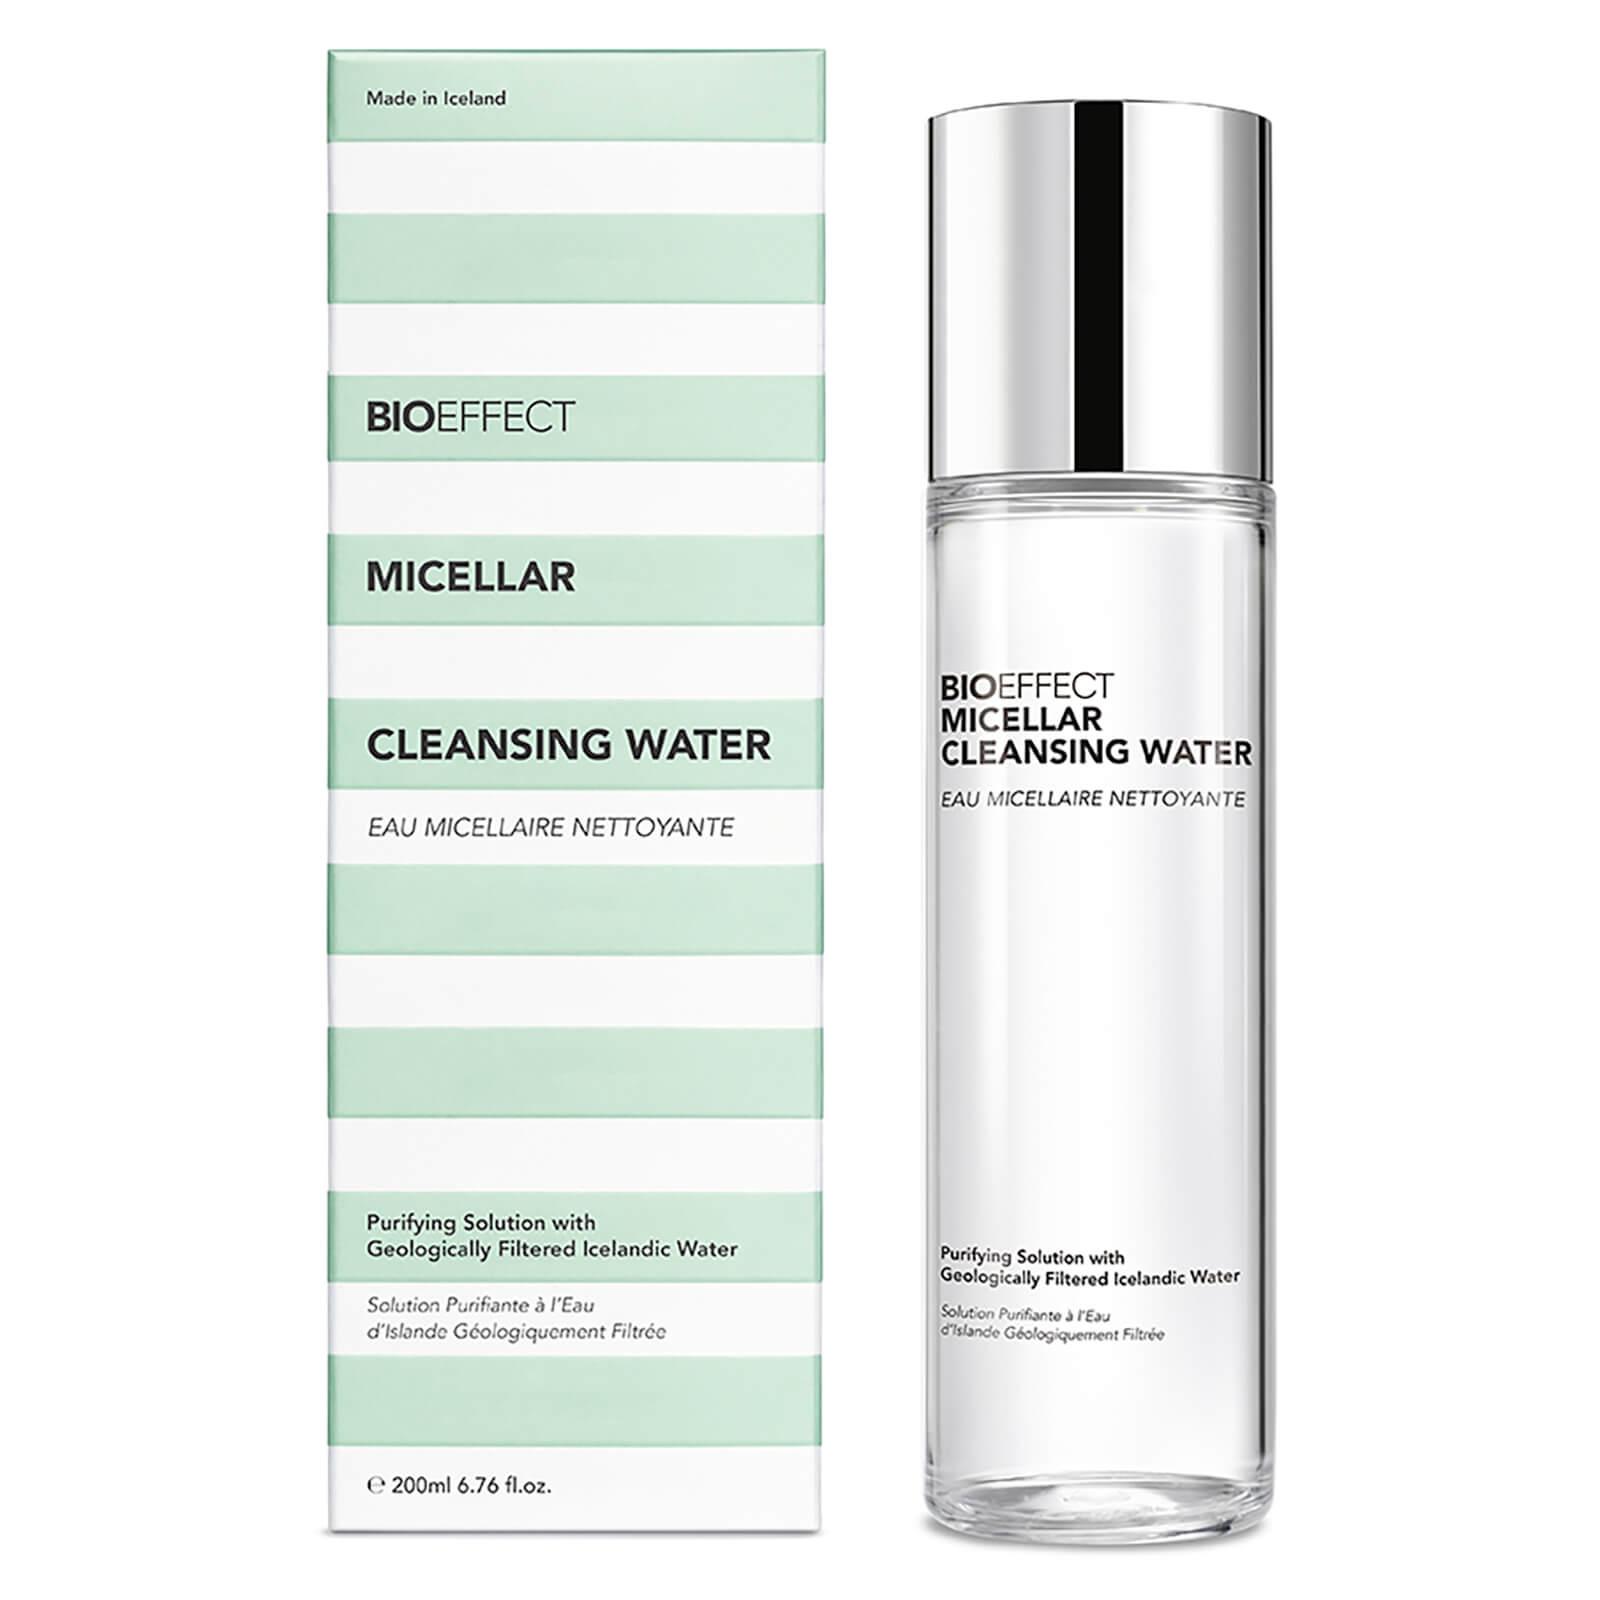 Купить Мицеллярная очищающая вода BIOEFFECT Micellar Cleansing Water 200 мл